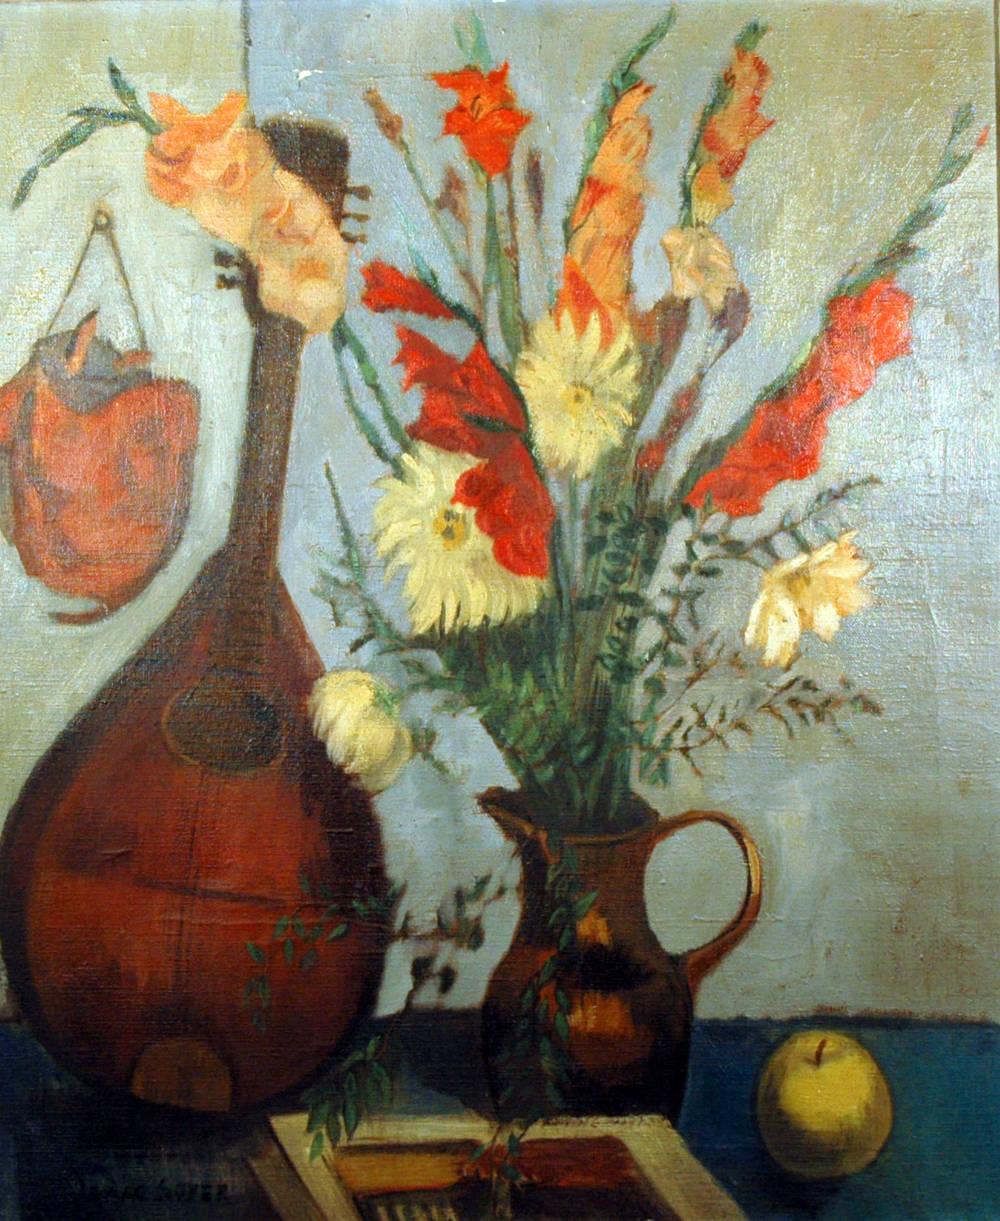 Mandolin & Vase